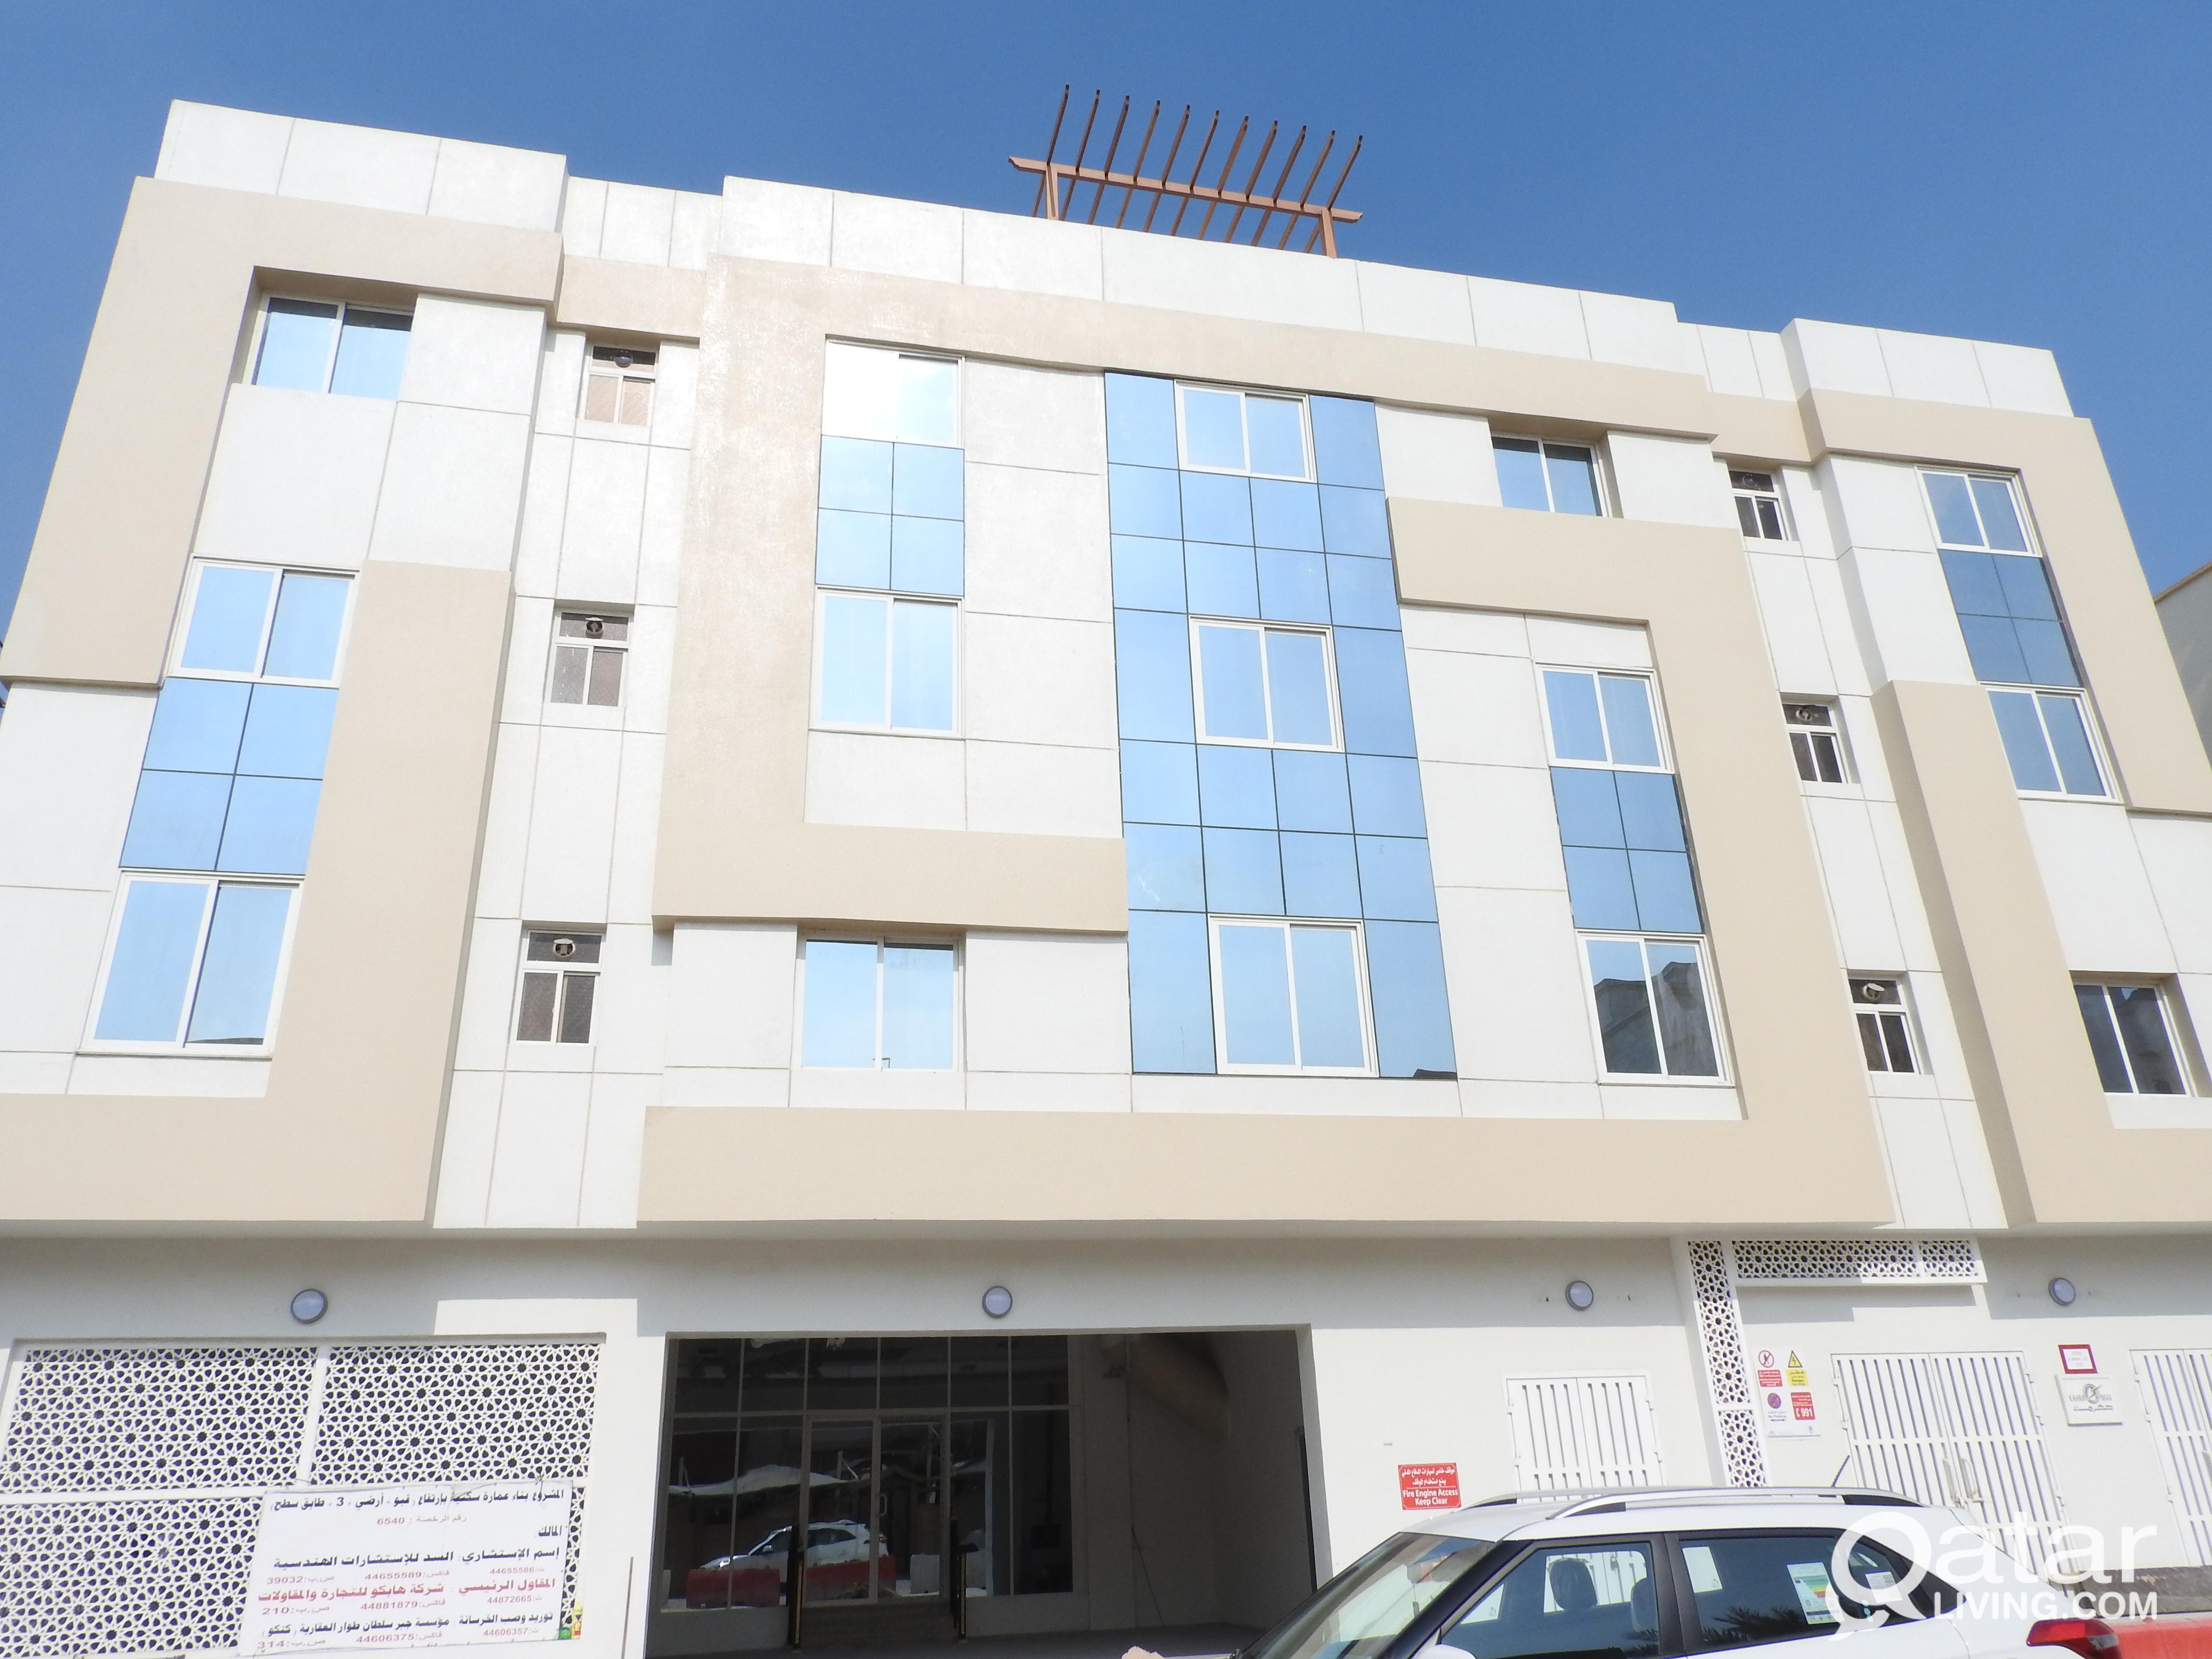 2 BHK Apartment in Wakrah near Qtel tower